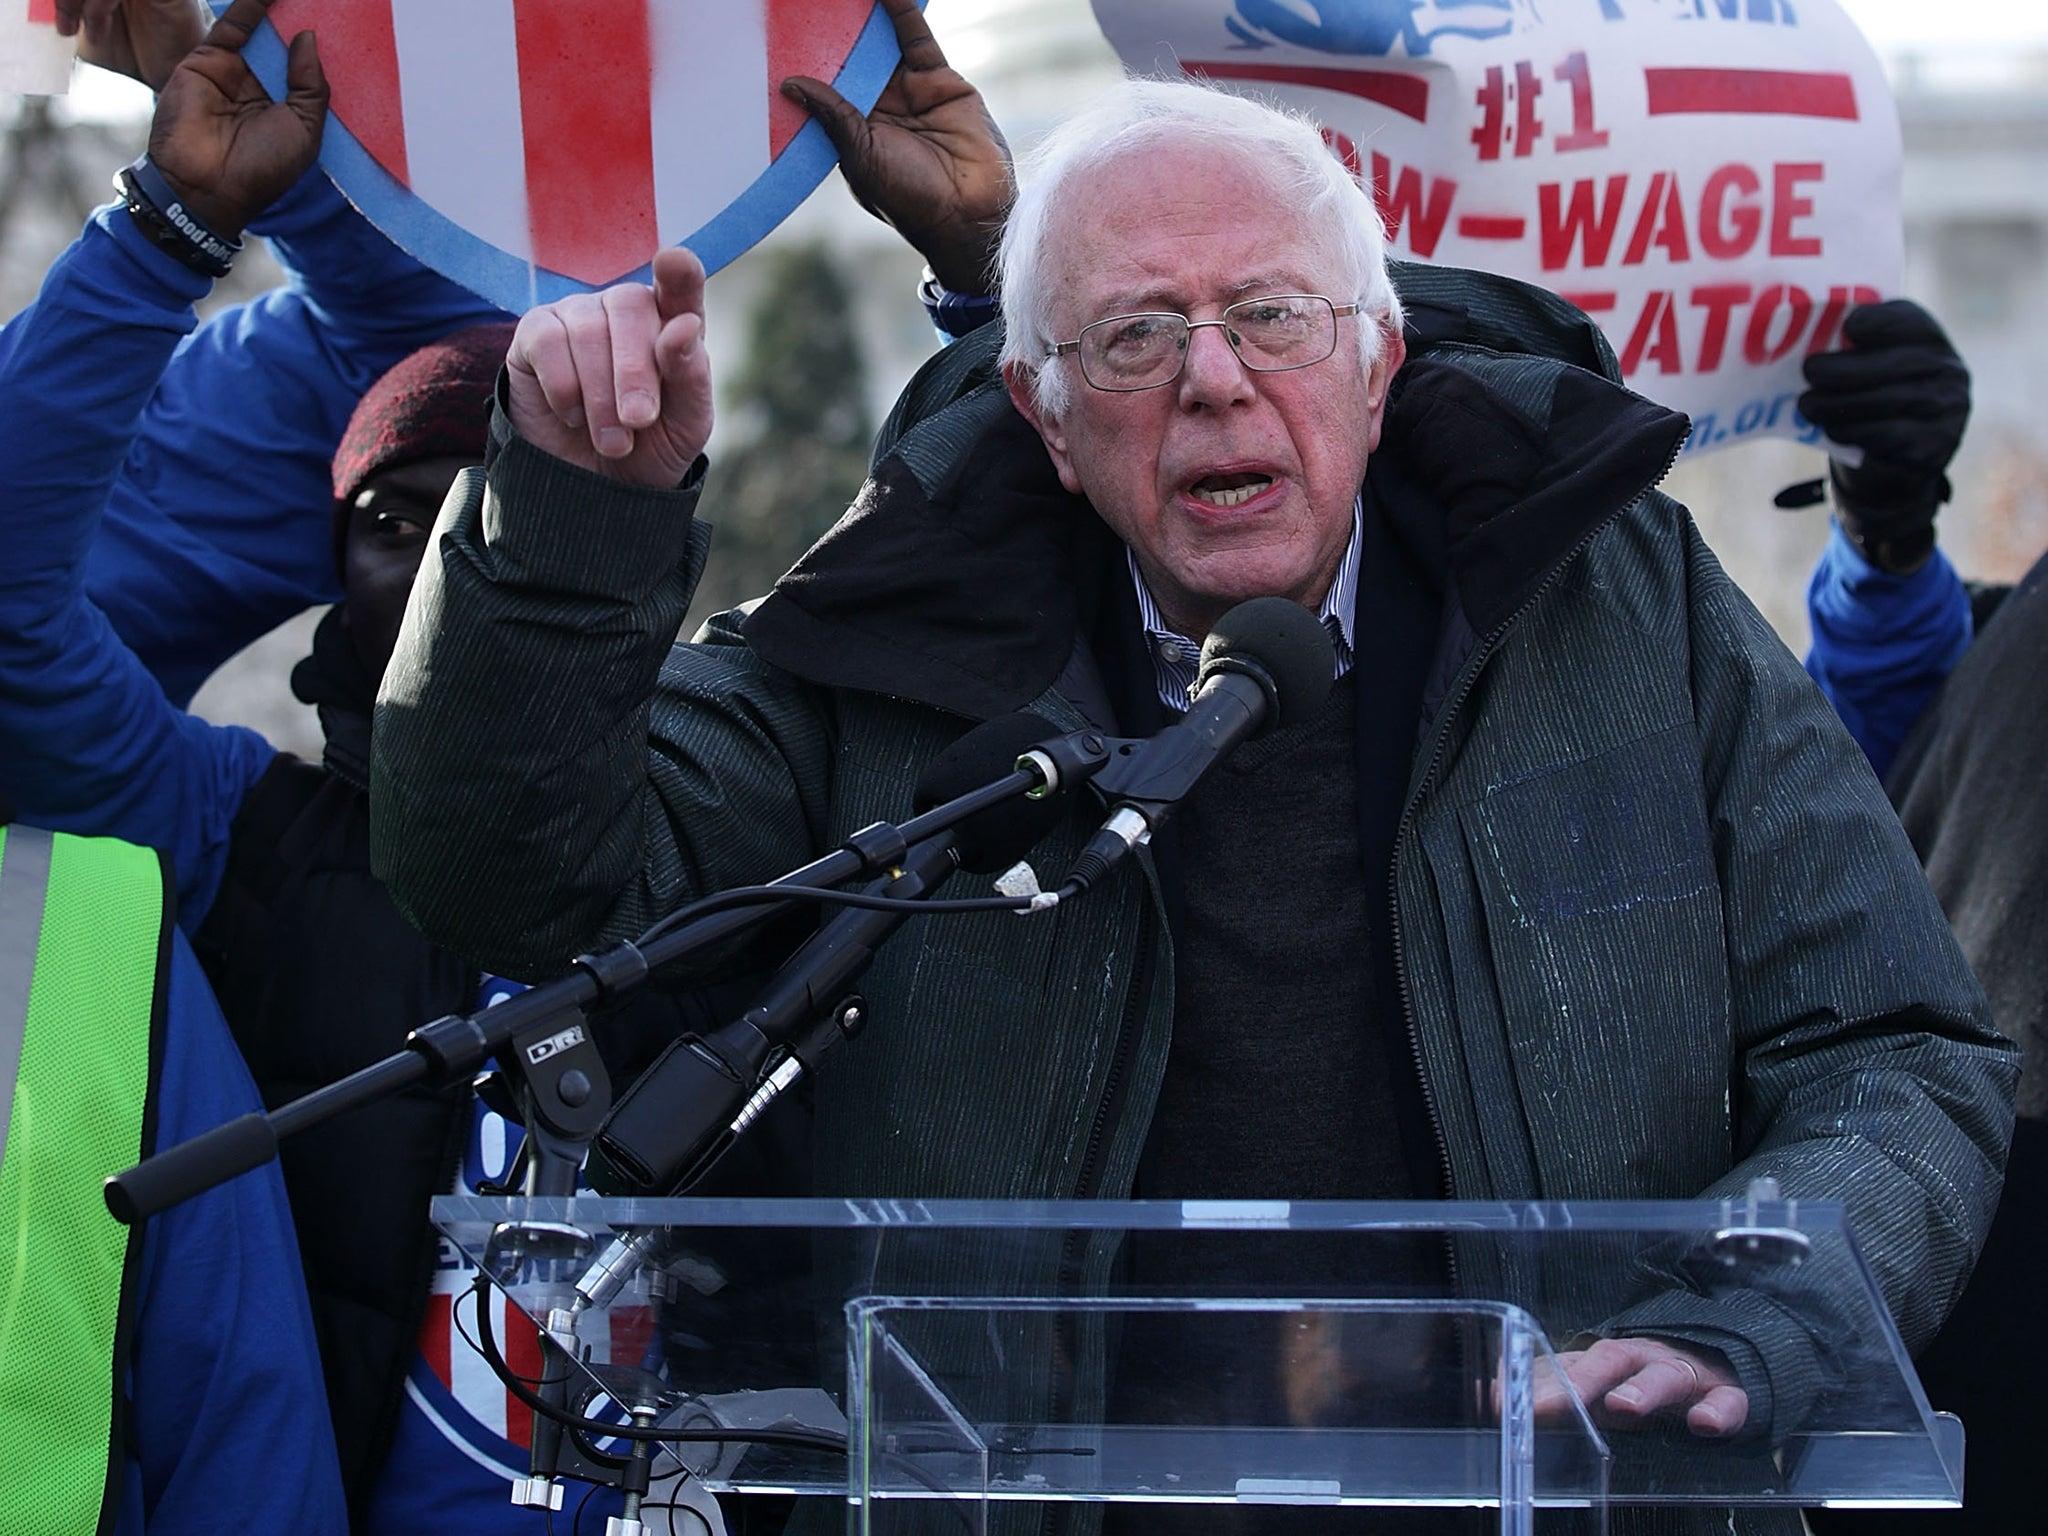 Bernie Sanders says Donald Trump administration is 'totalitarian'